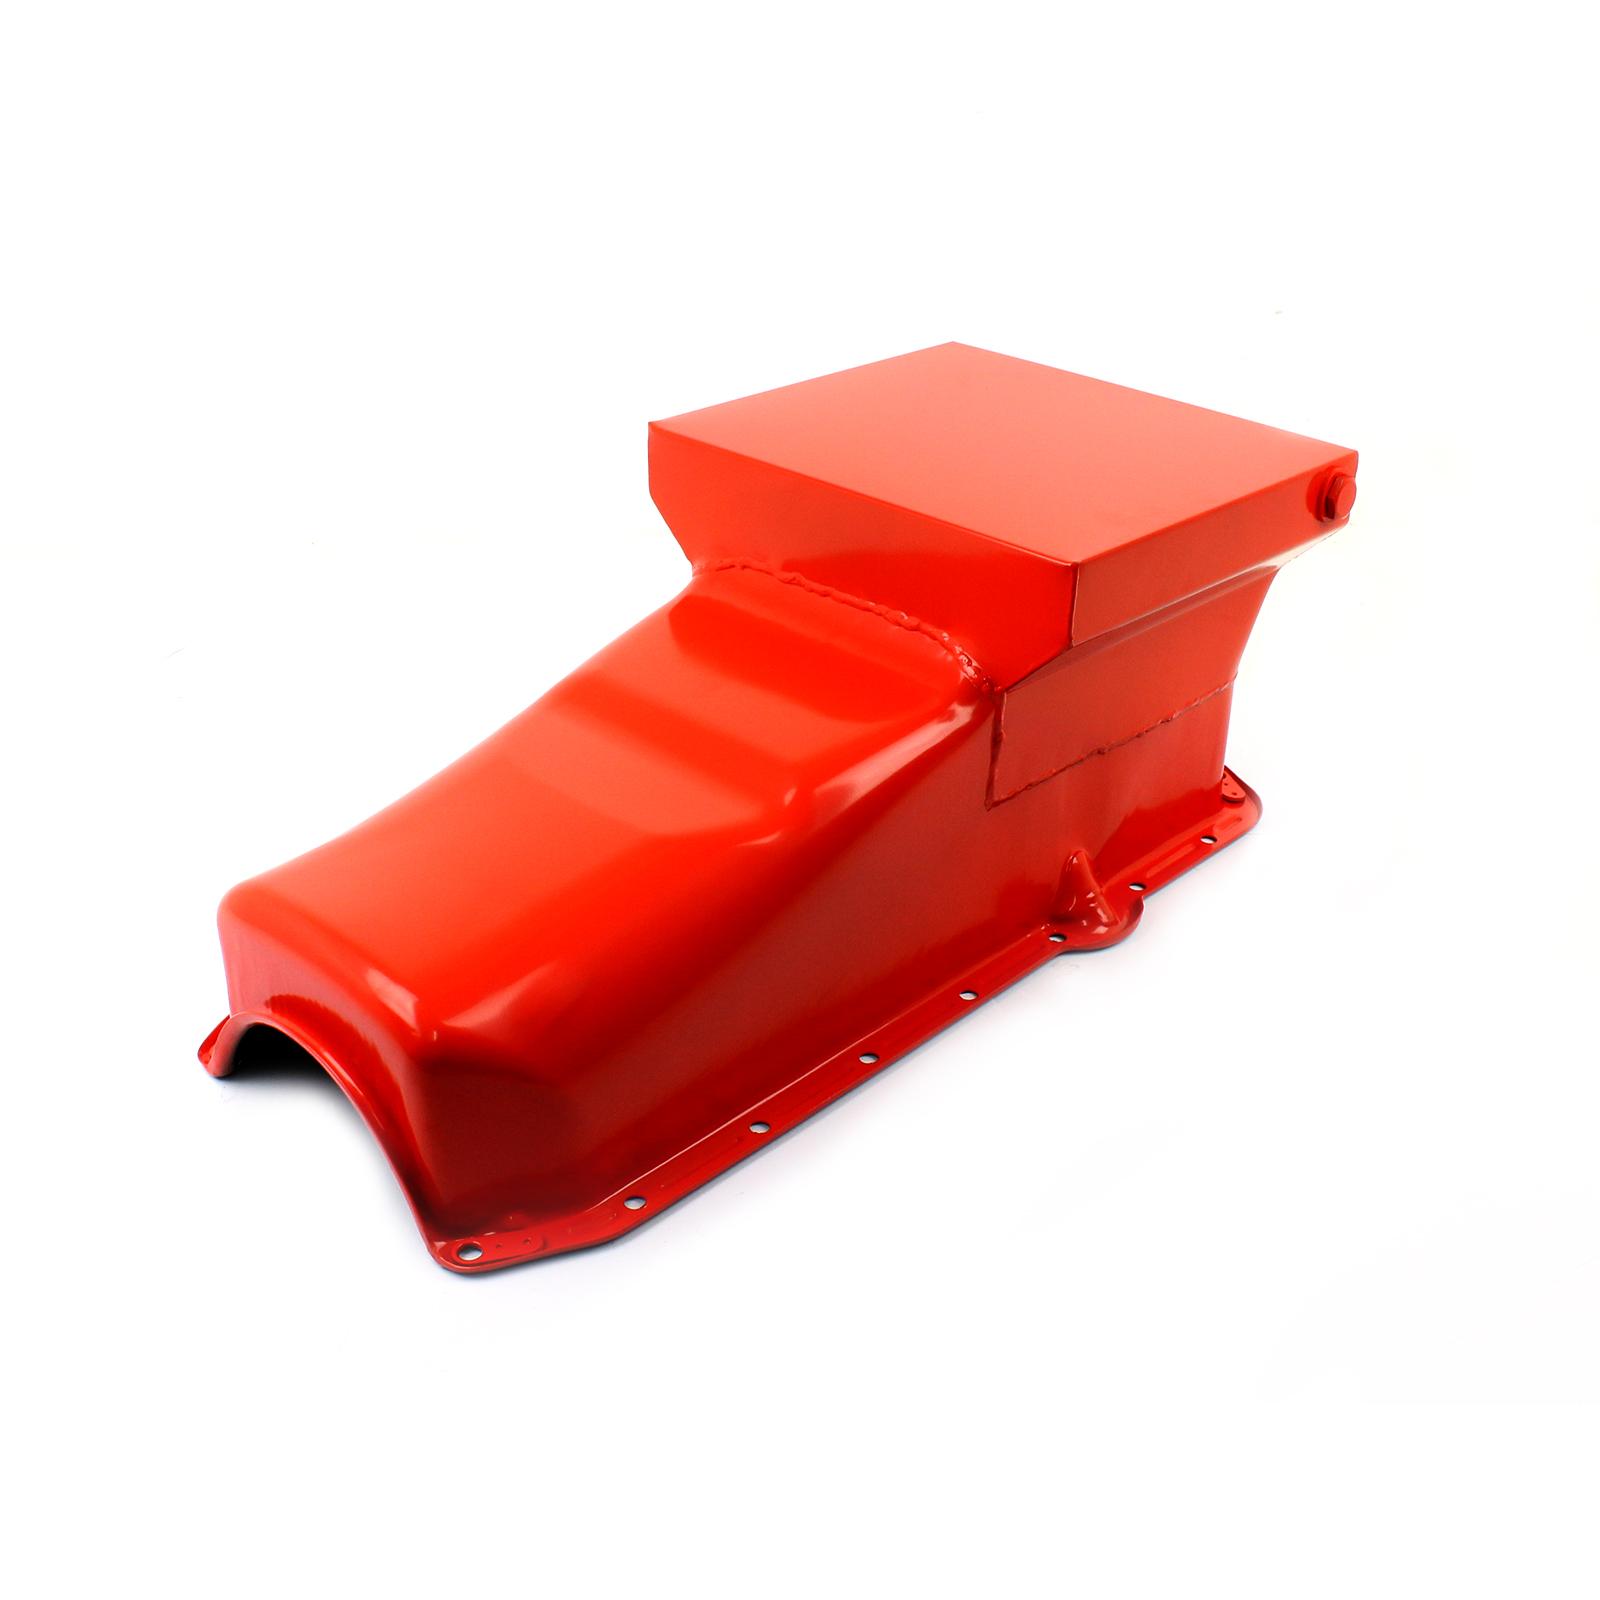 Chevy SBC 350 7Qt Drag Rear Sump RH Side 2Pcs Rms Orange Oil Pan